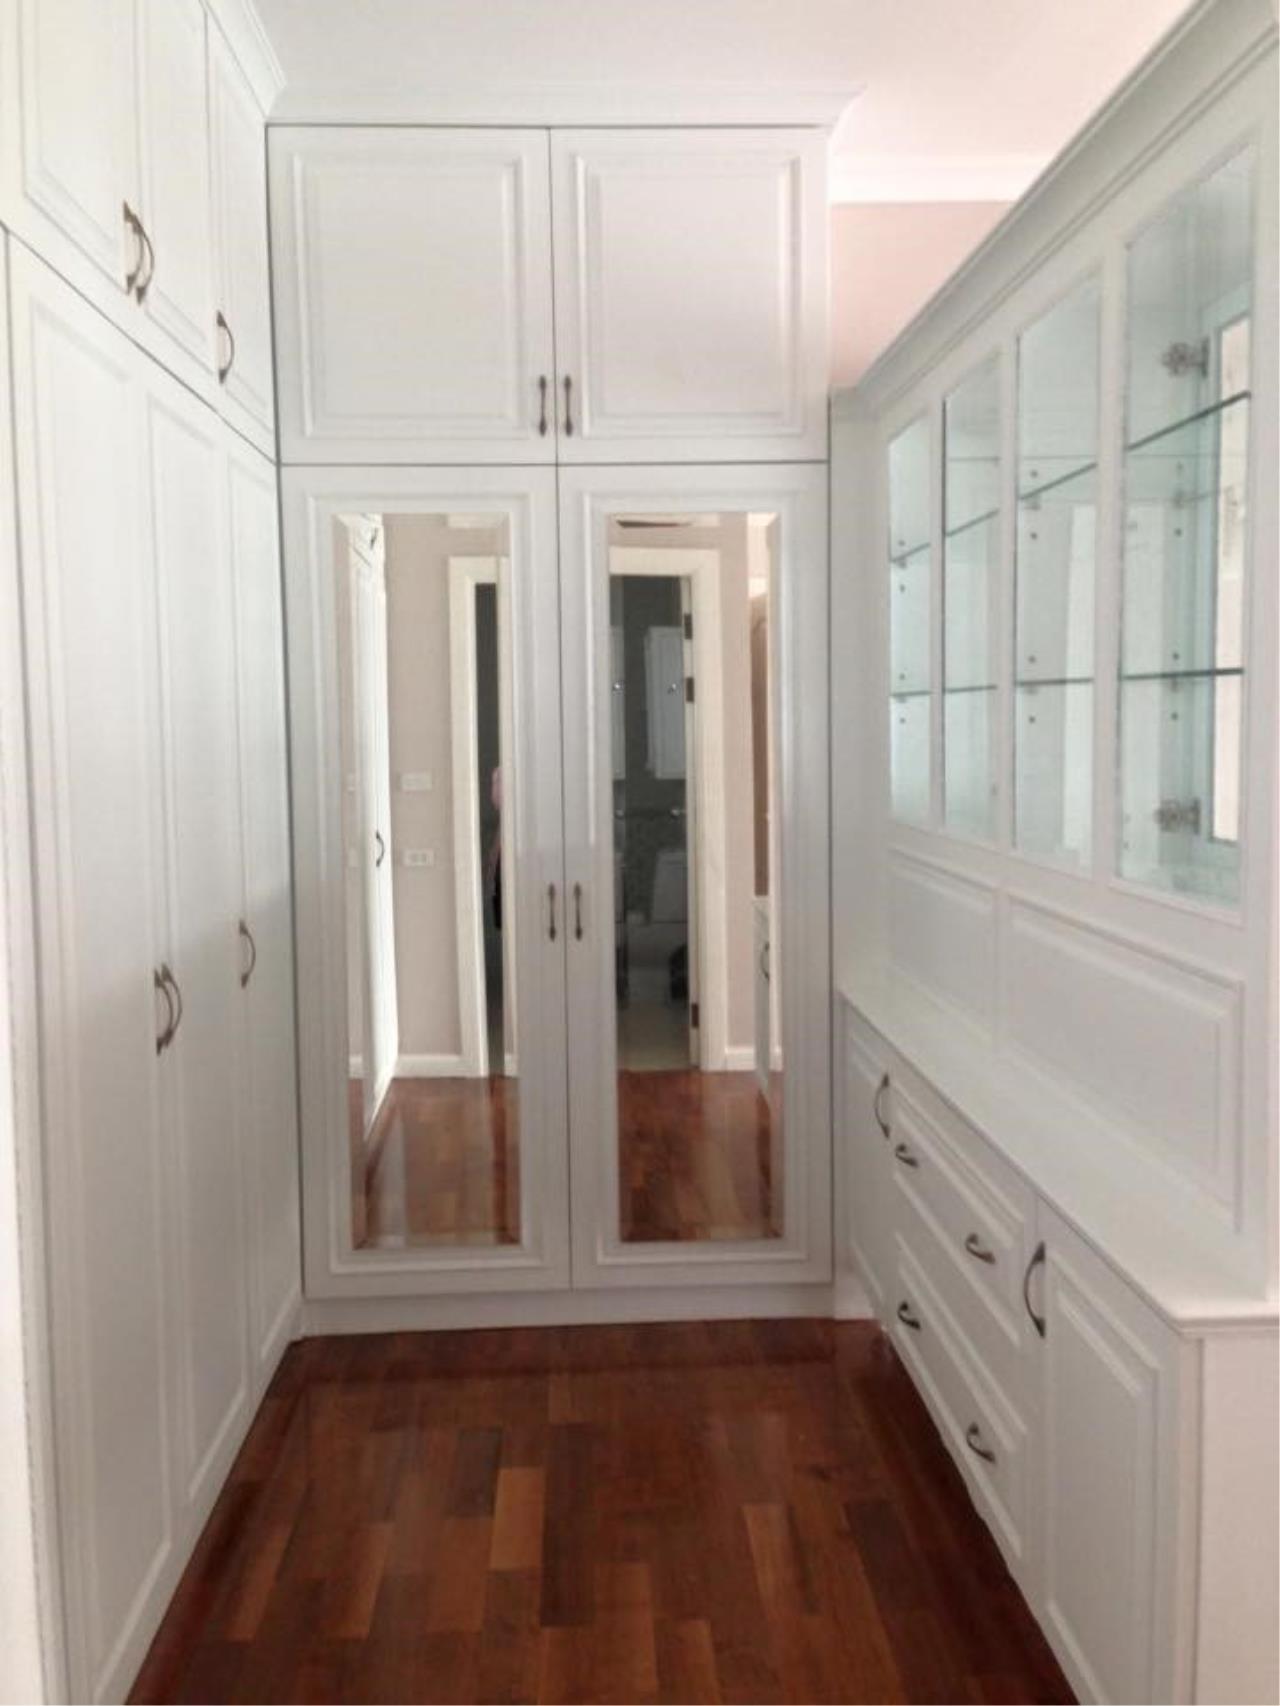 Piri Property Agency's 3 Plus 1 Bedroom Single House for Rent - Fantasia Villa 9